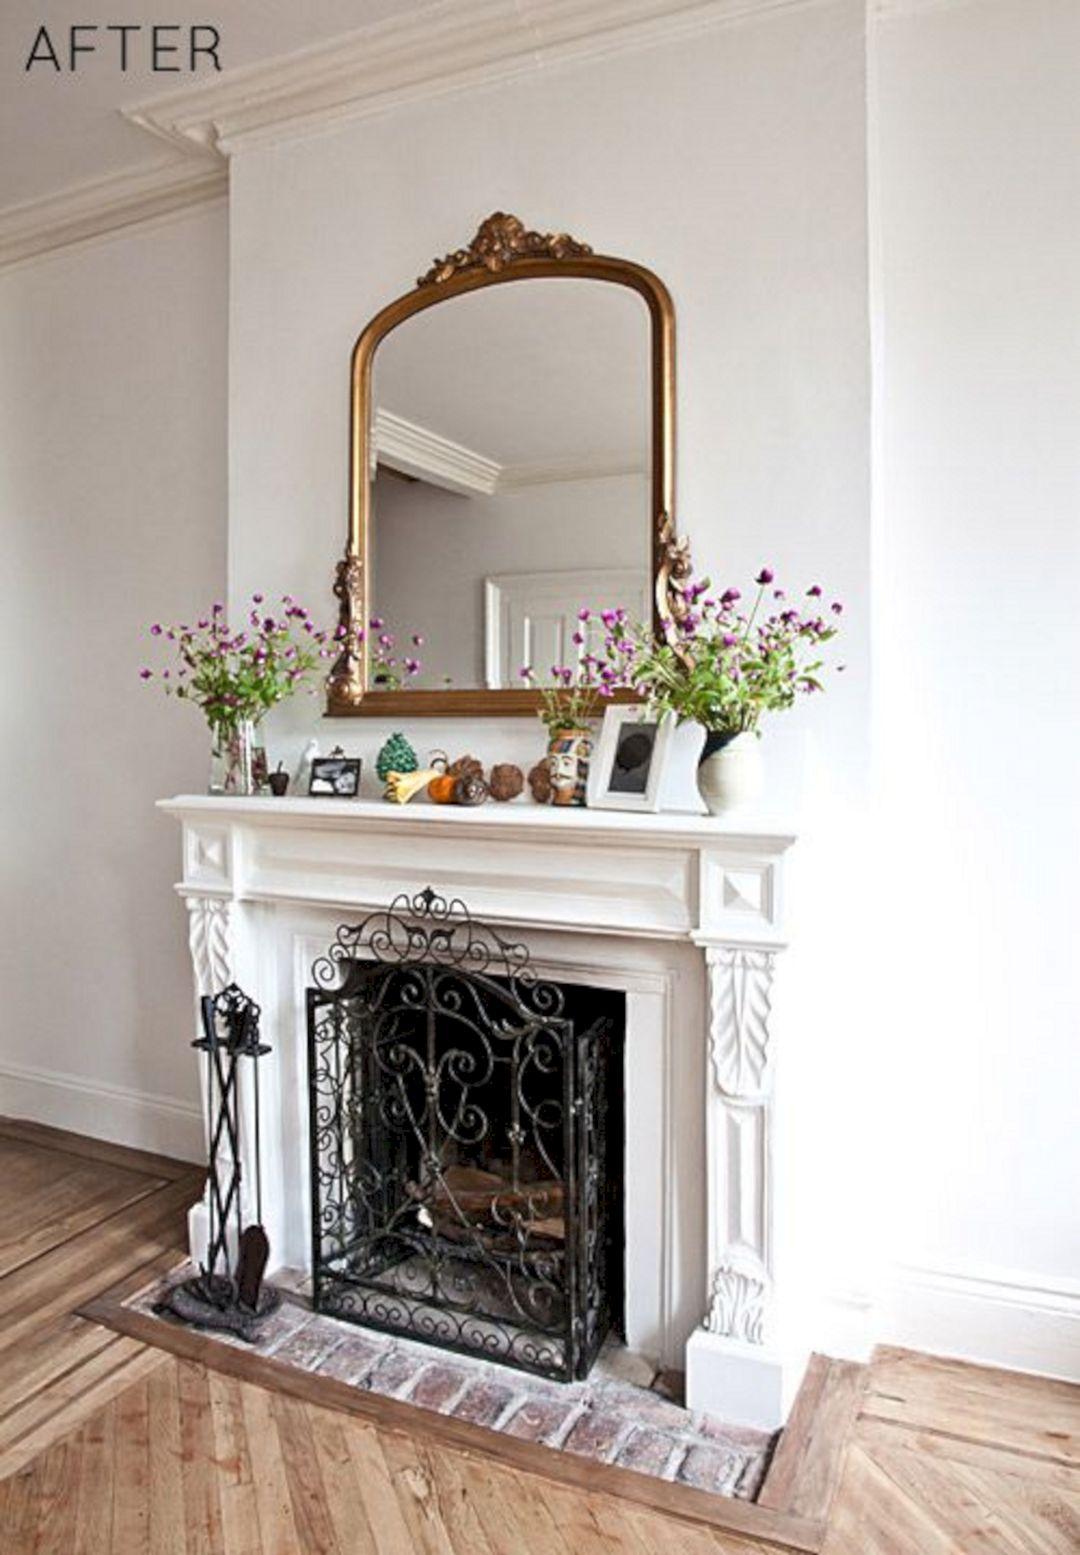 Brick Vintage Fireplace With Mirror (Brick Vintage